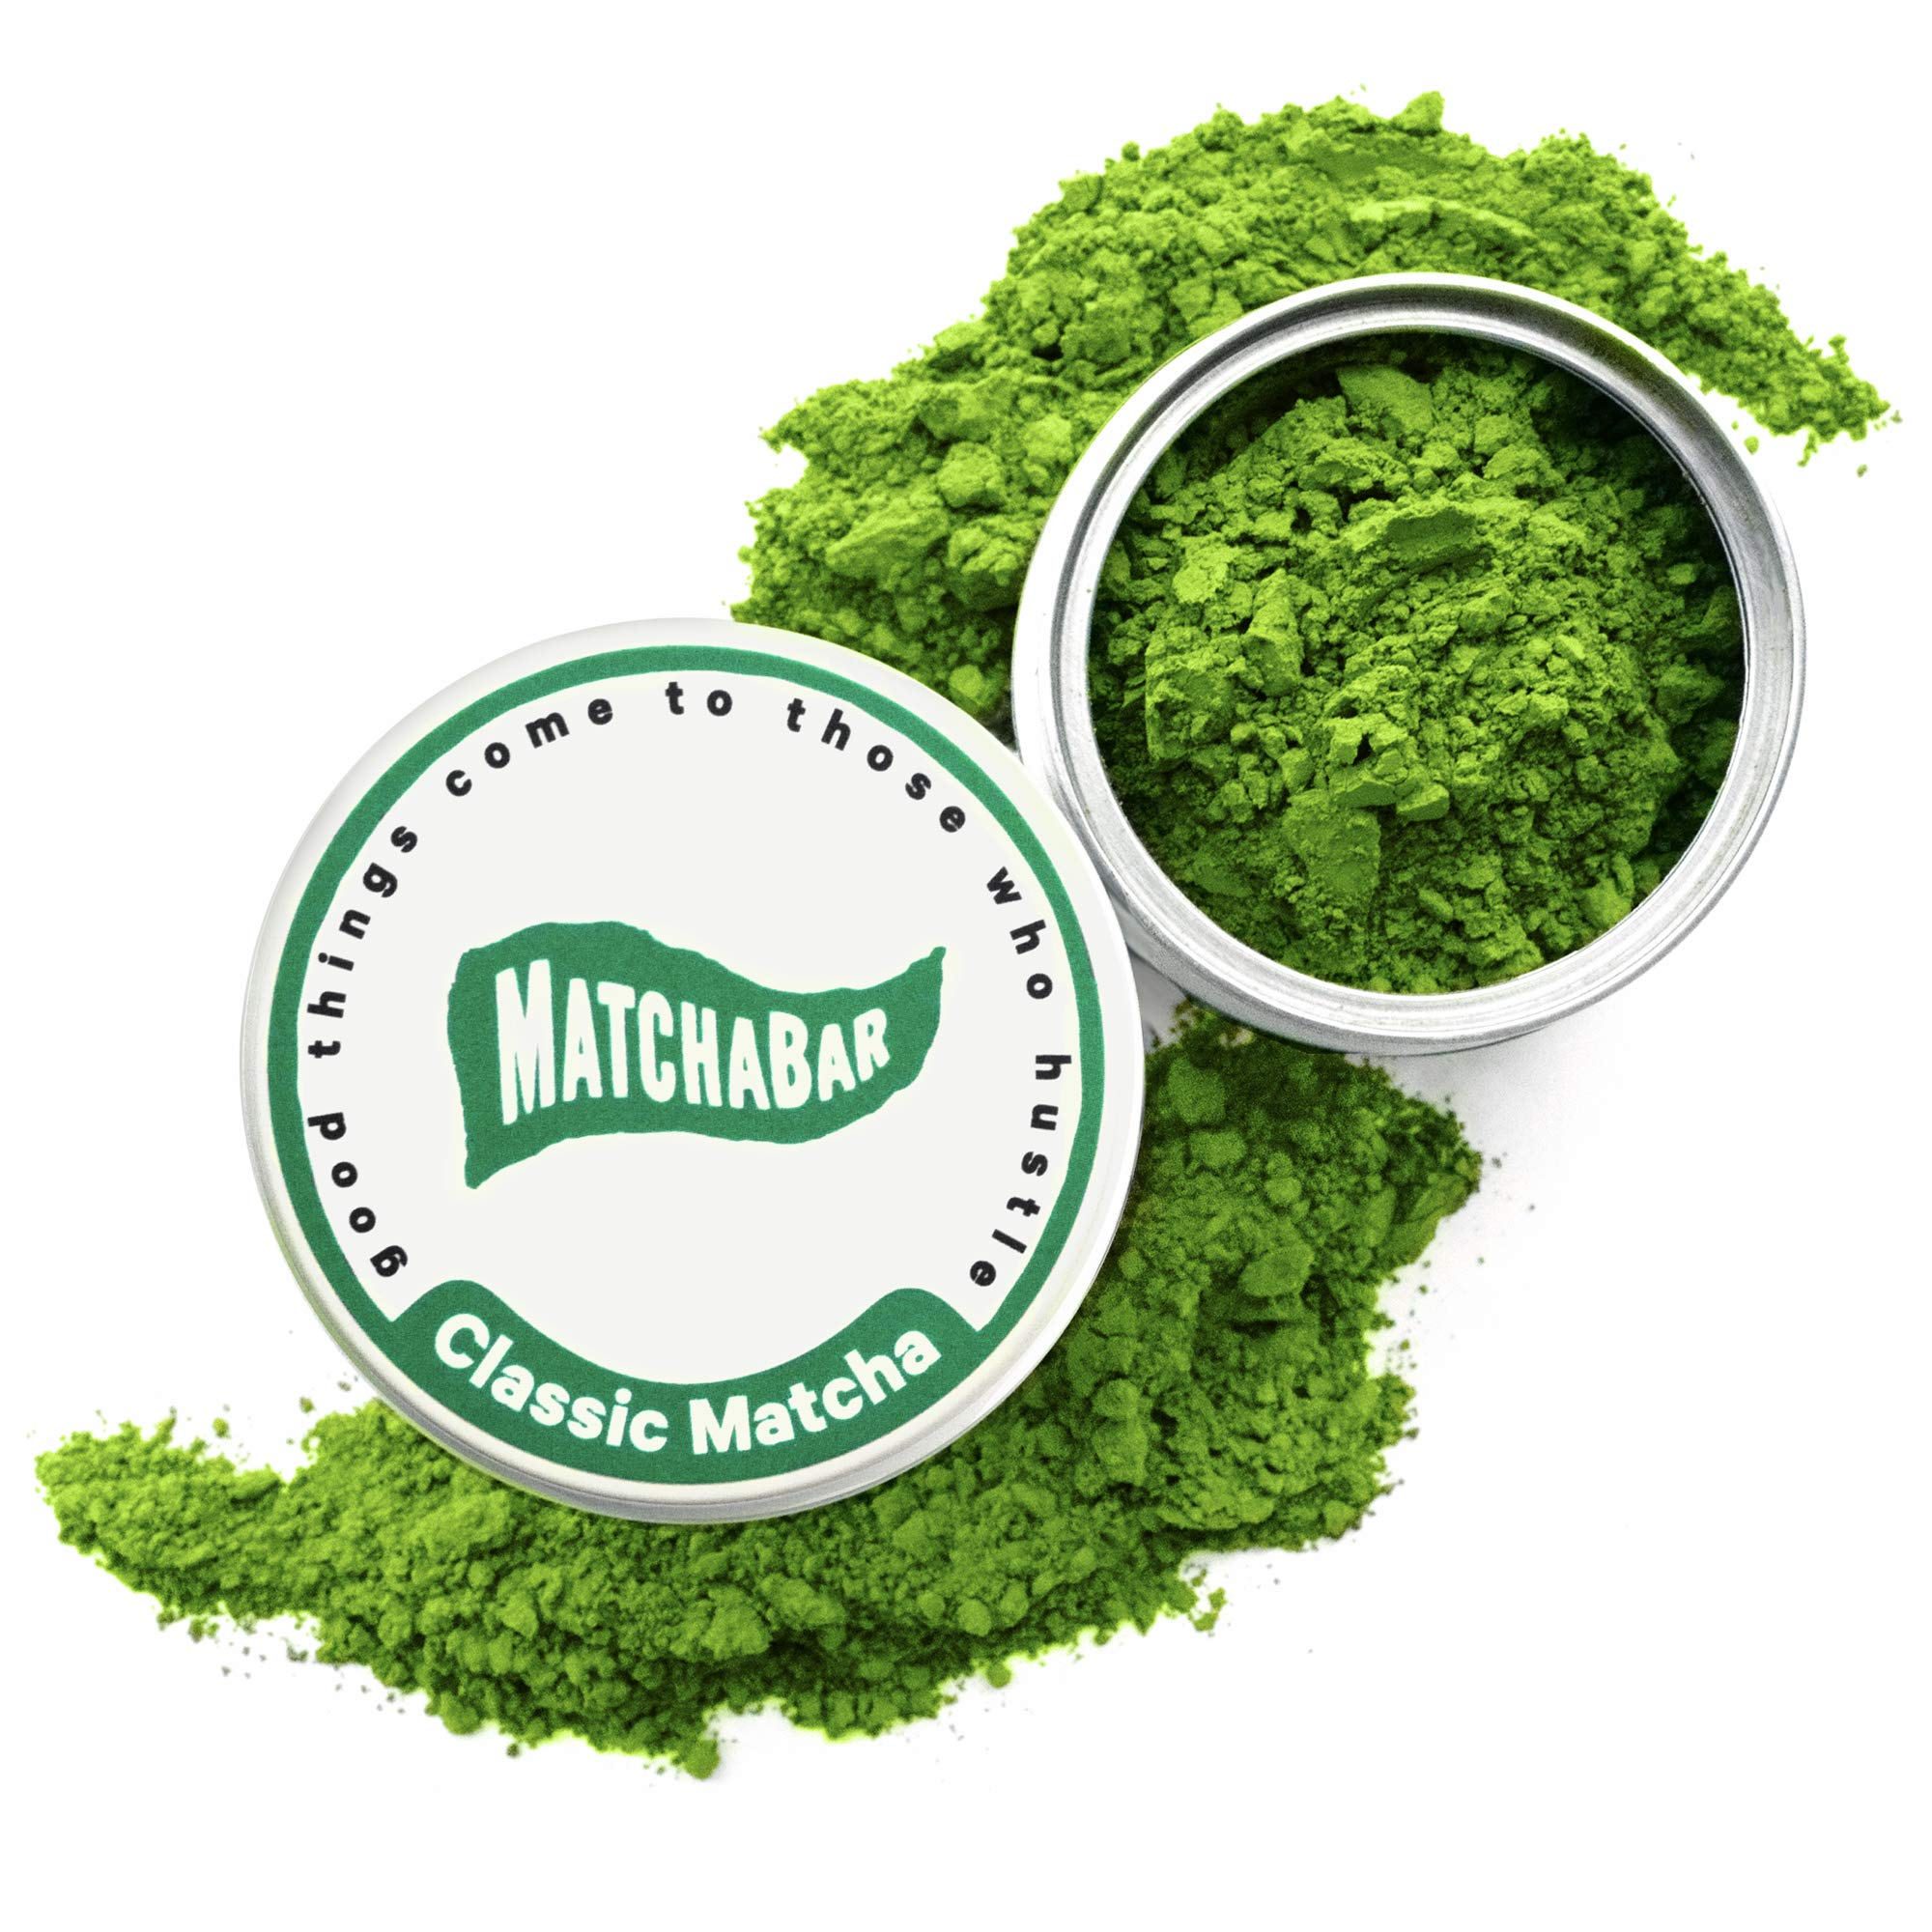 MatchaBar Matcha Green Tea Powder   Ceremonial Grade Japanese Green Tea with Caffeine & Antioxidants   For Sipping or Latte   80g Tin by MatchaBar